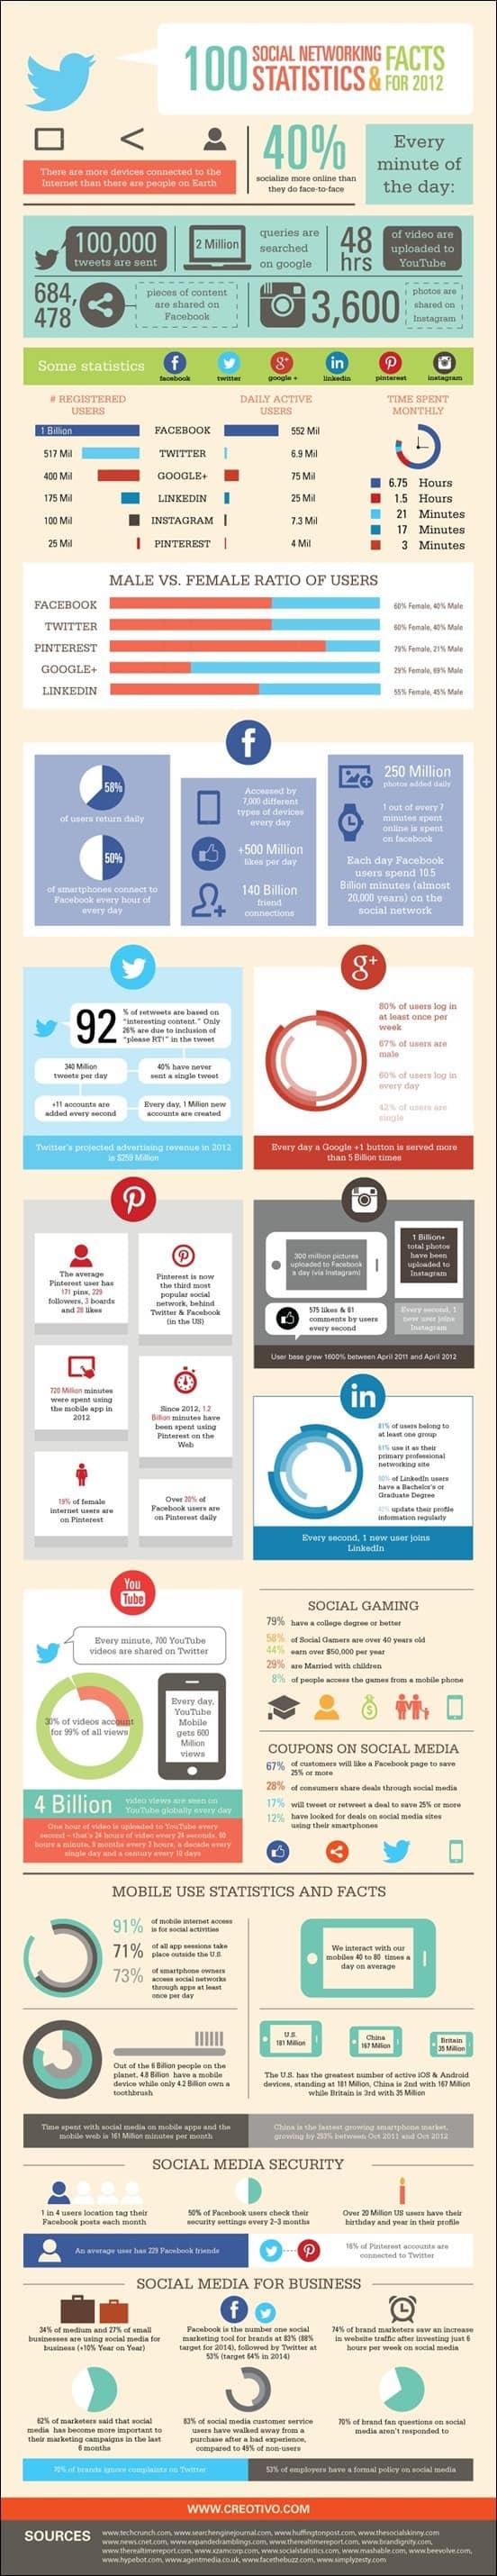 100-social-media-statistics-facts-and-figures